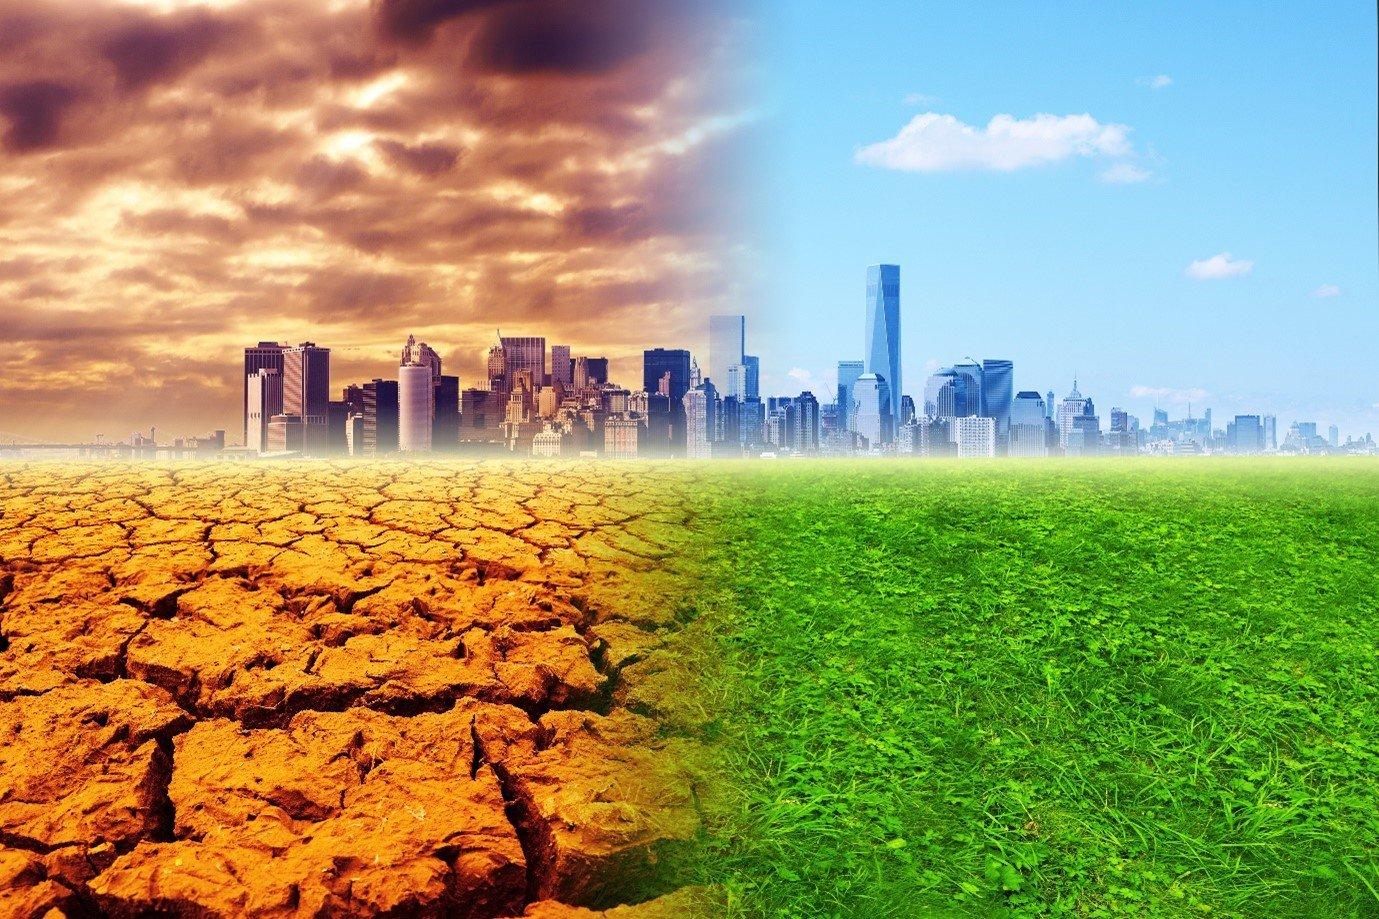 climatechangeimage